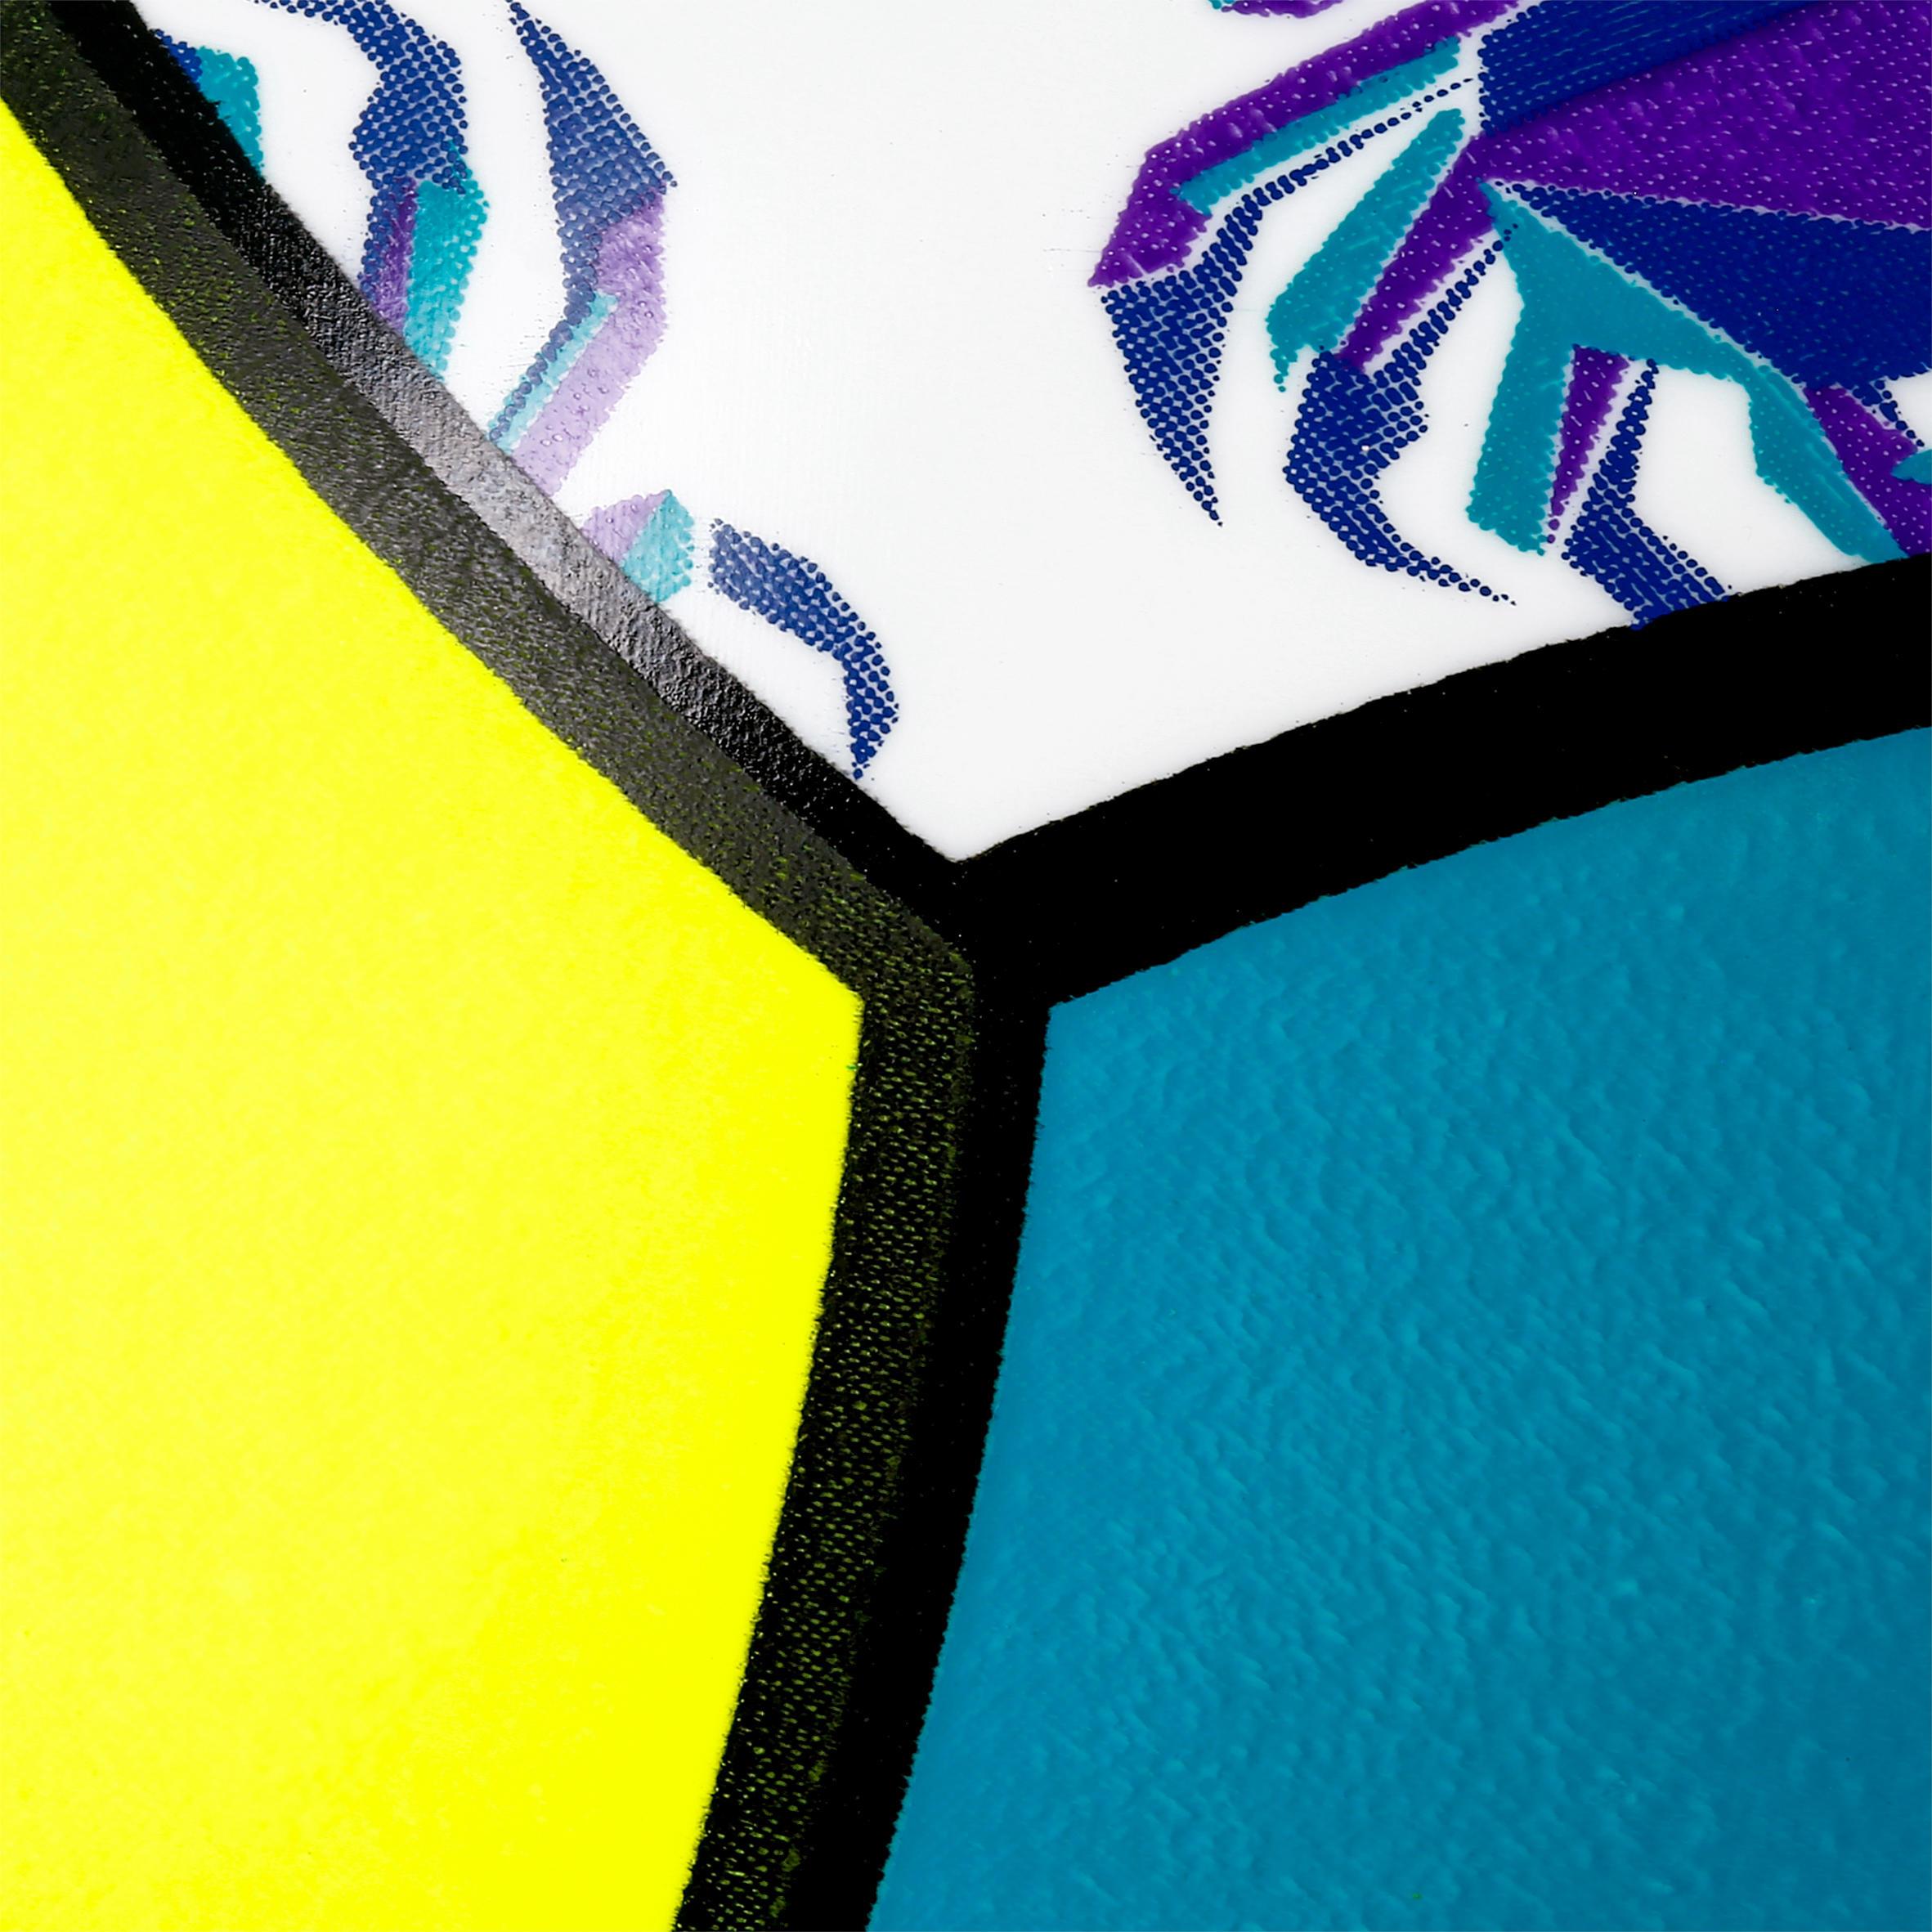 BV100 Beach Volleyball - Yellow/Green